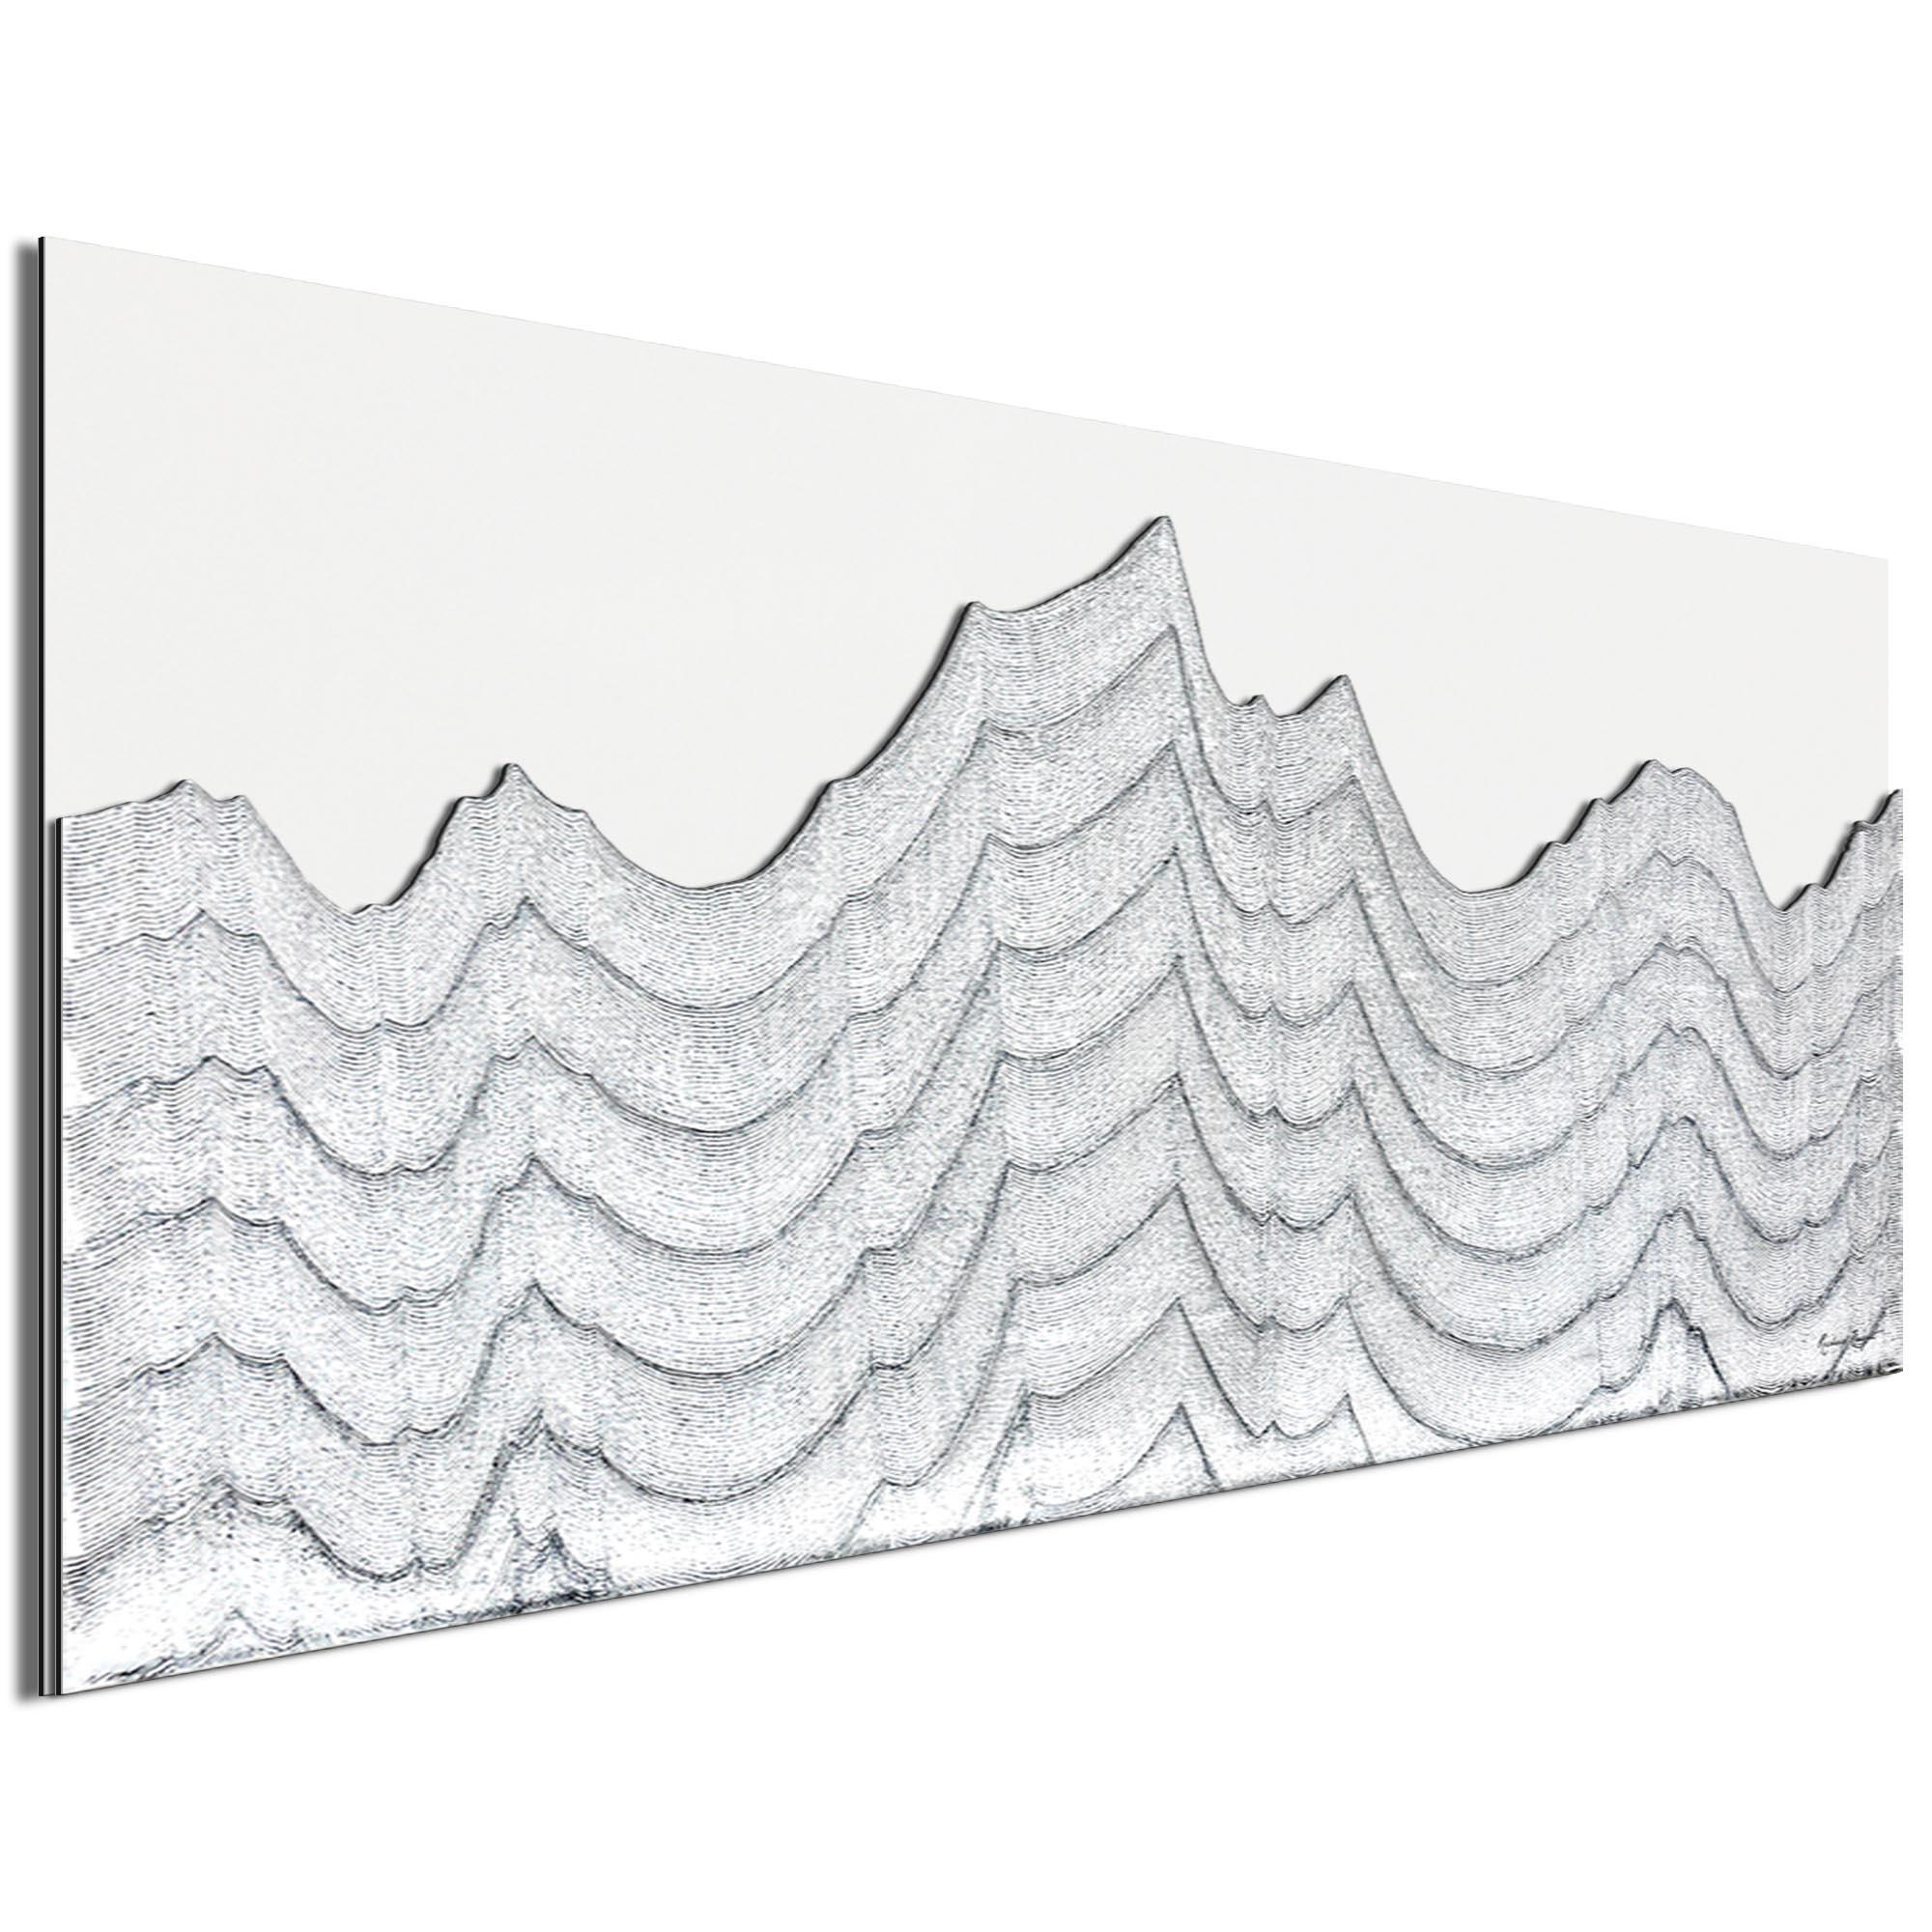 Whitewashed Horizon by Richard Knight - Ltd. Ed. Minimalist Abstract Landscape Art - Image 2